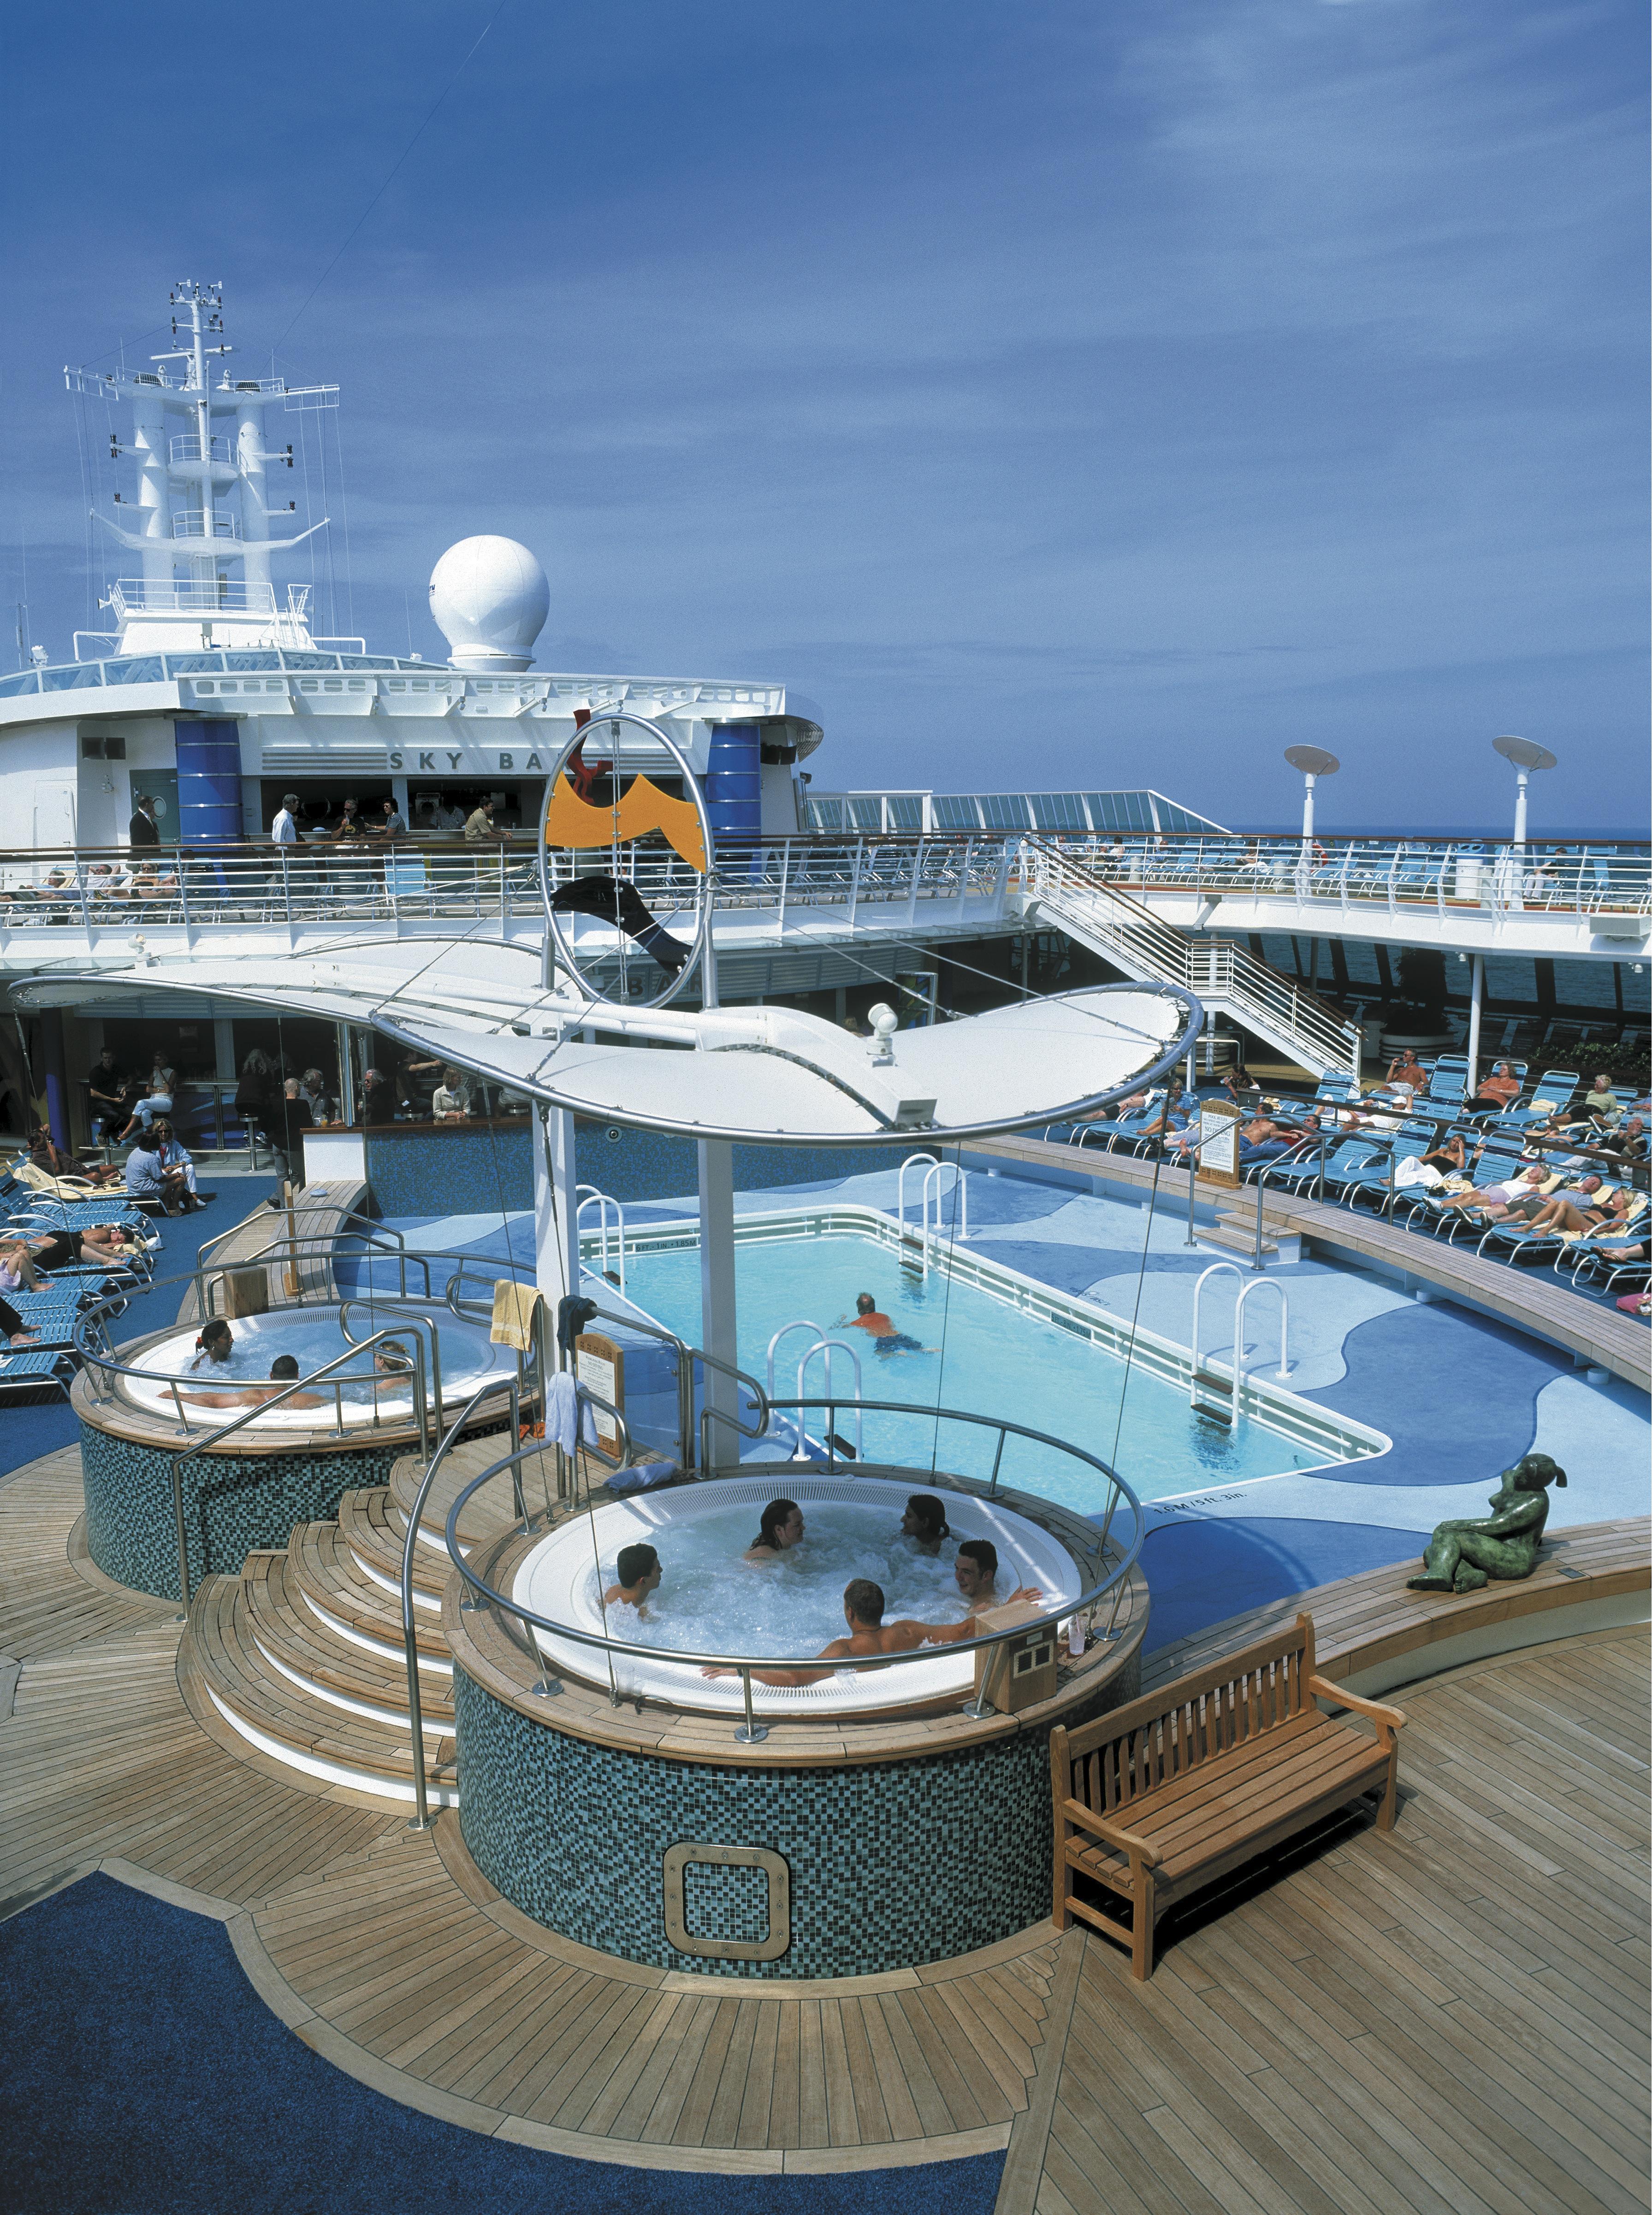 Royal Caribbean International Brilliance of the Seas Exterior Whirlpools.jpeg